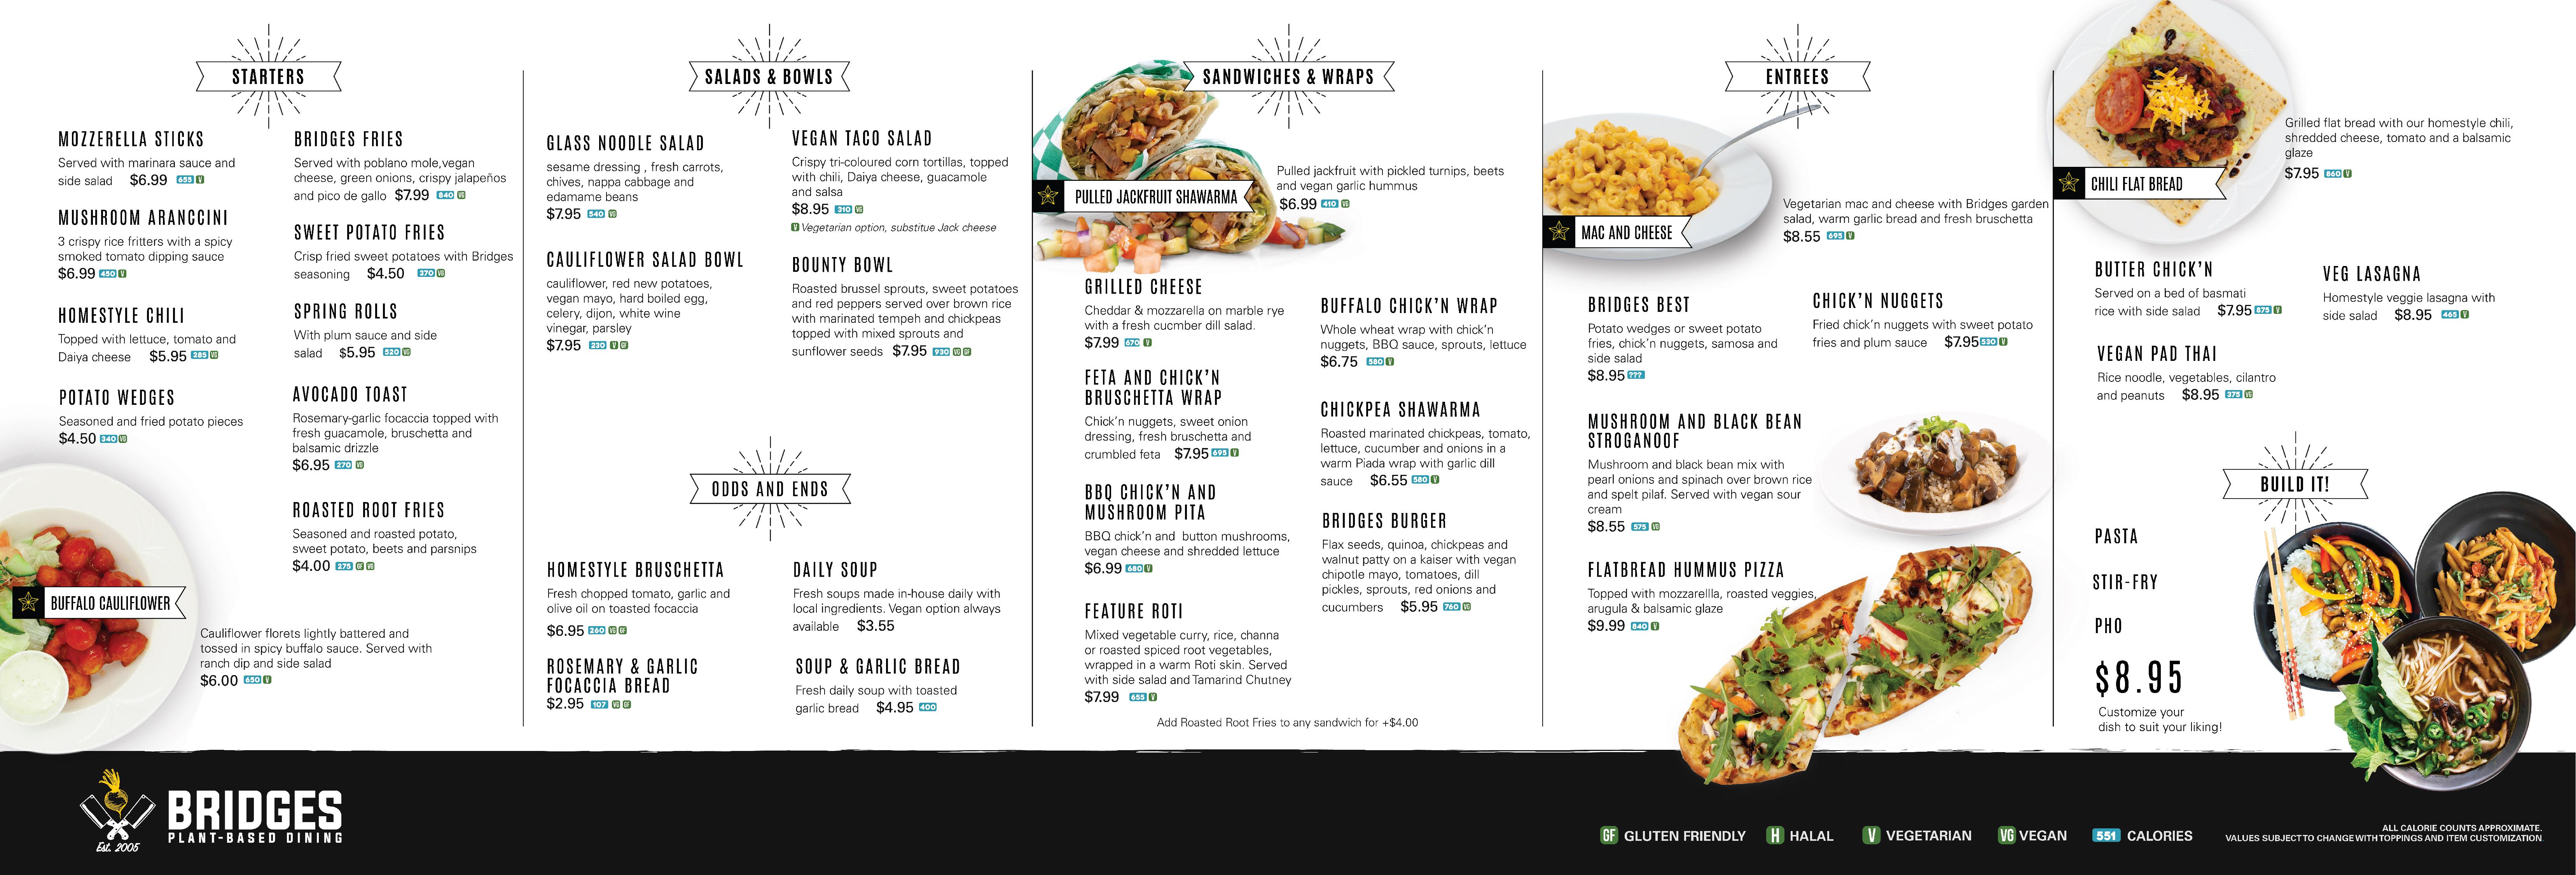 menu graphics